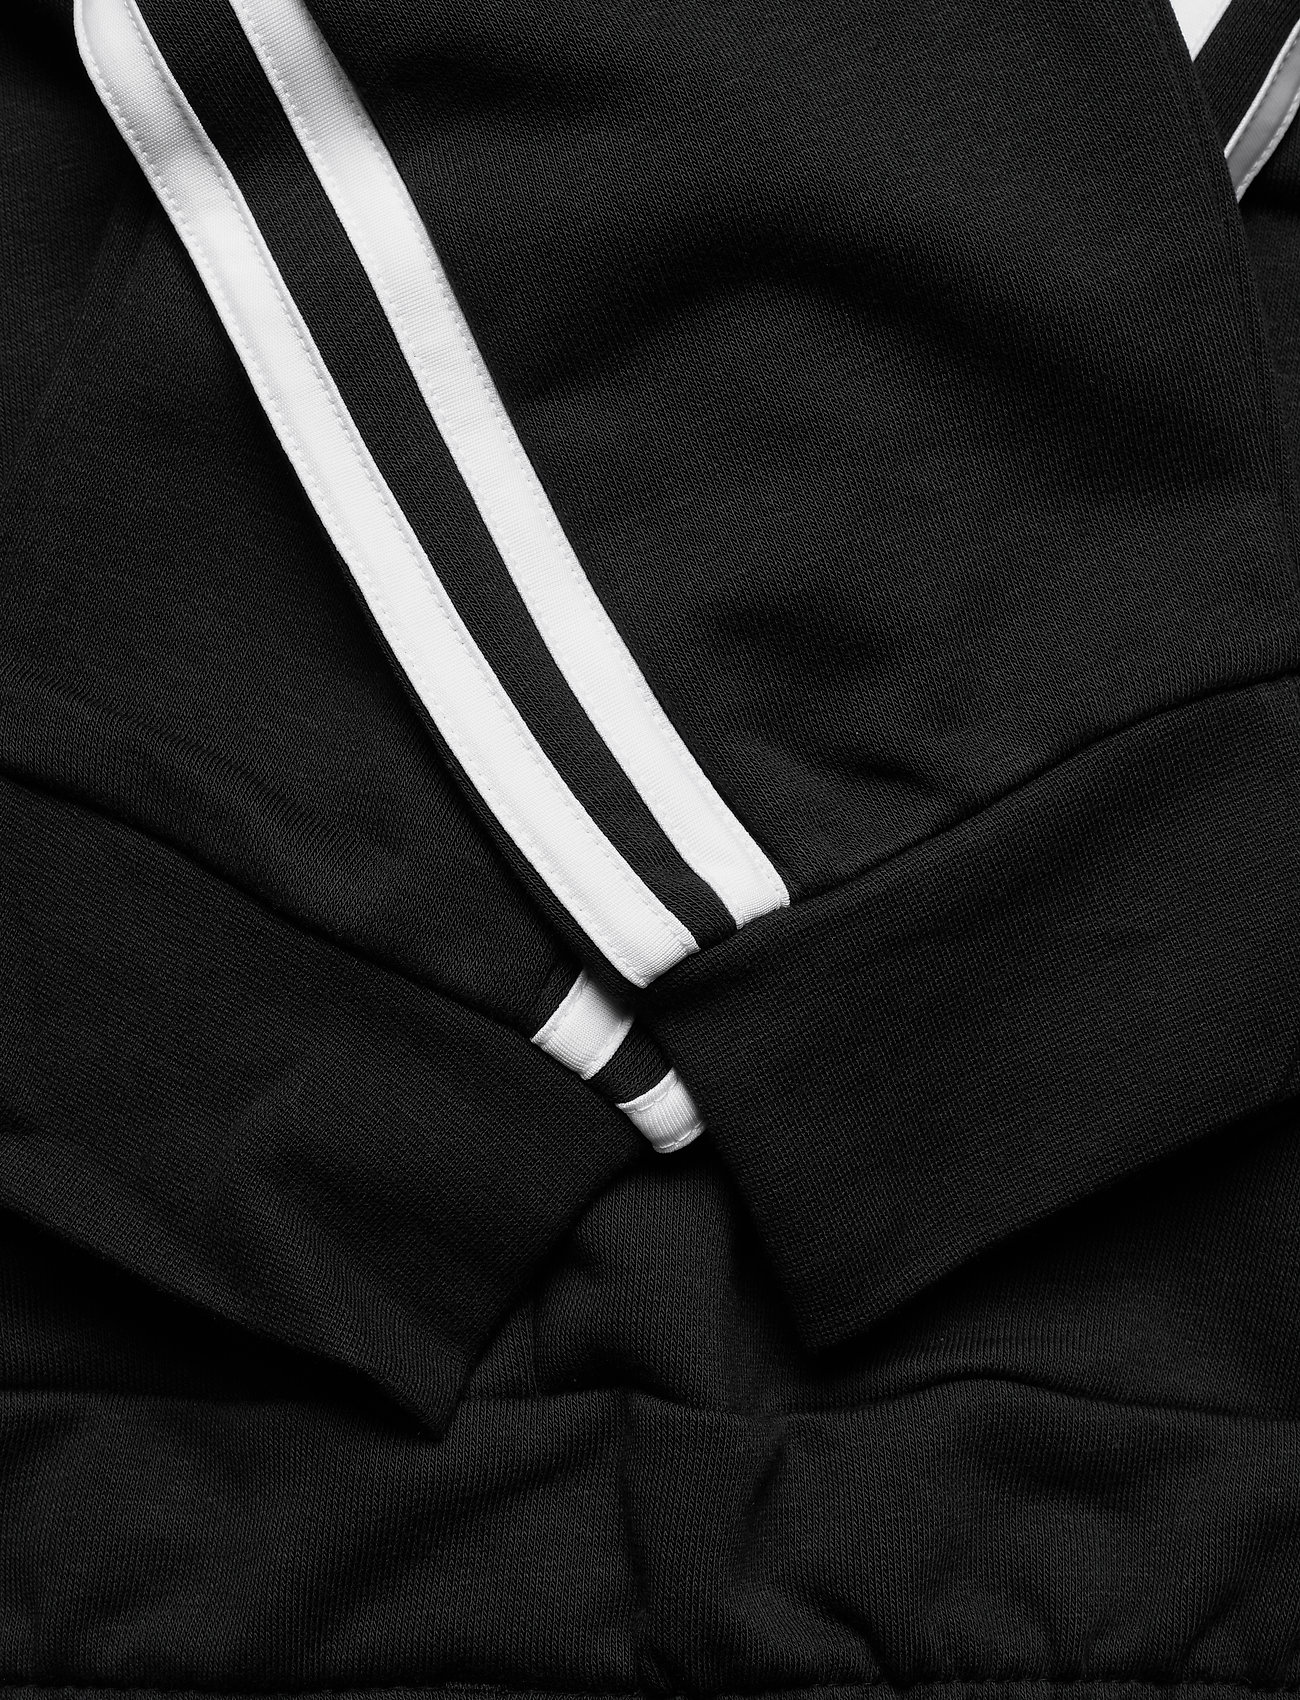 W E 3s Pant (Black/white) (383.20 kr) - adidas Performance